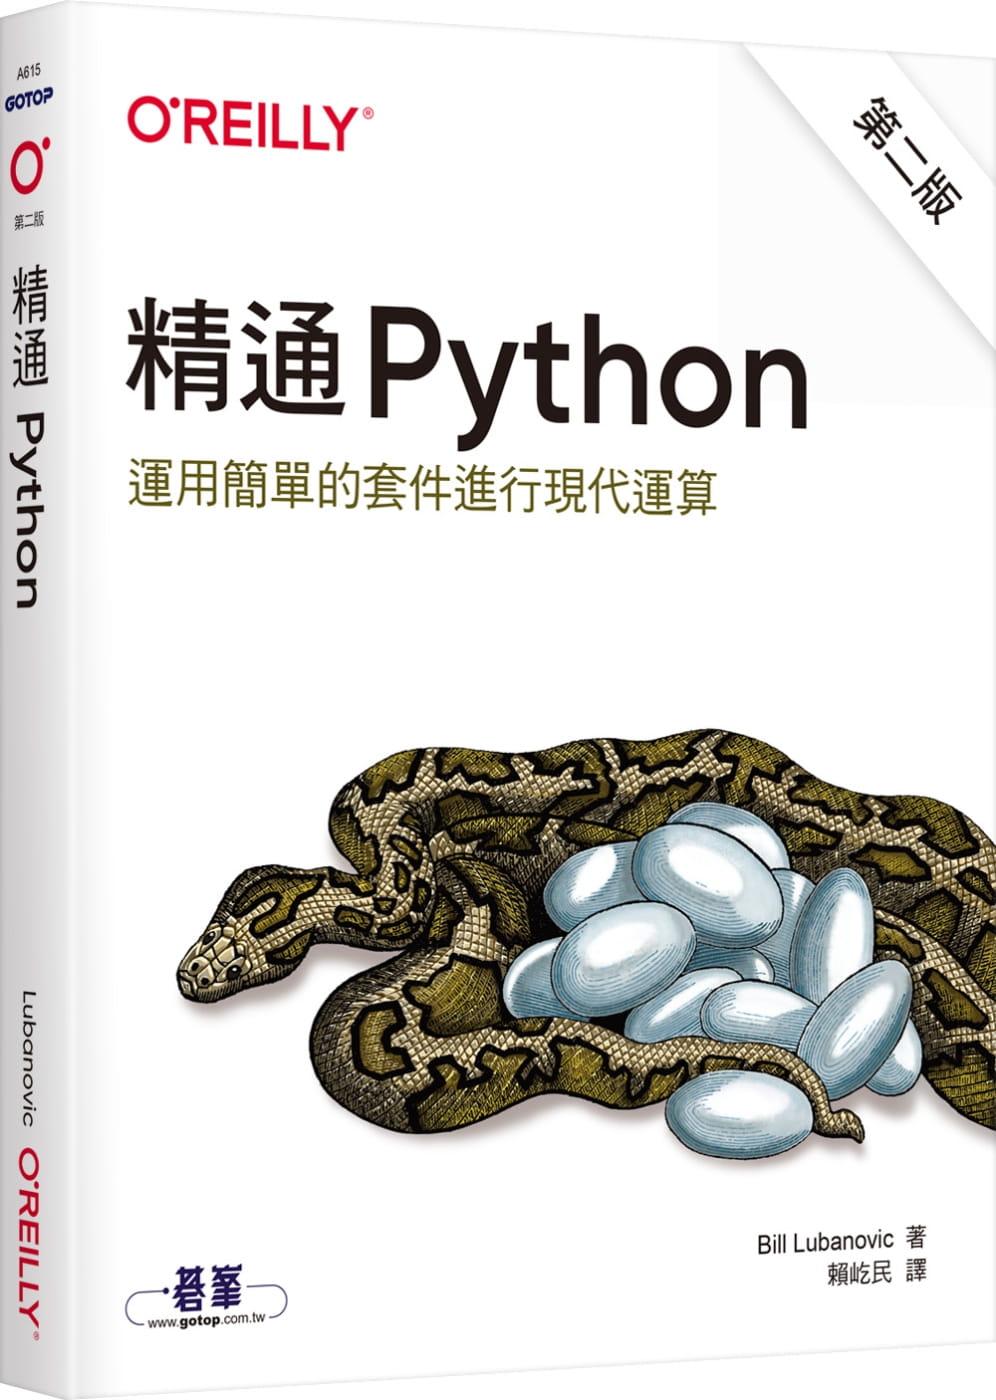 Python 入門書推薦 歐萊禮 新書封